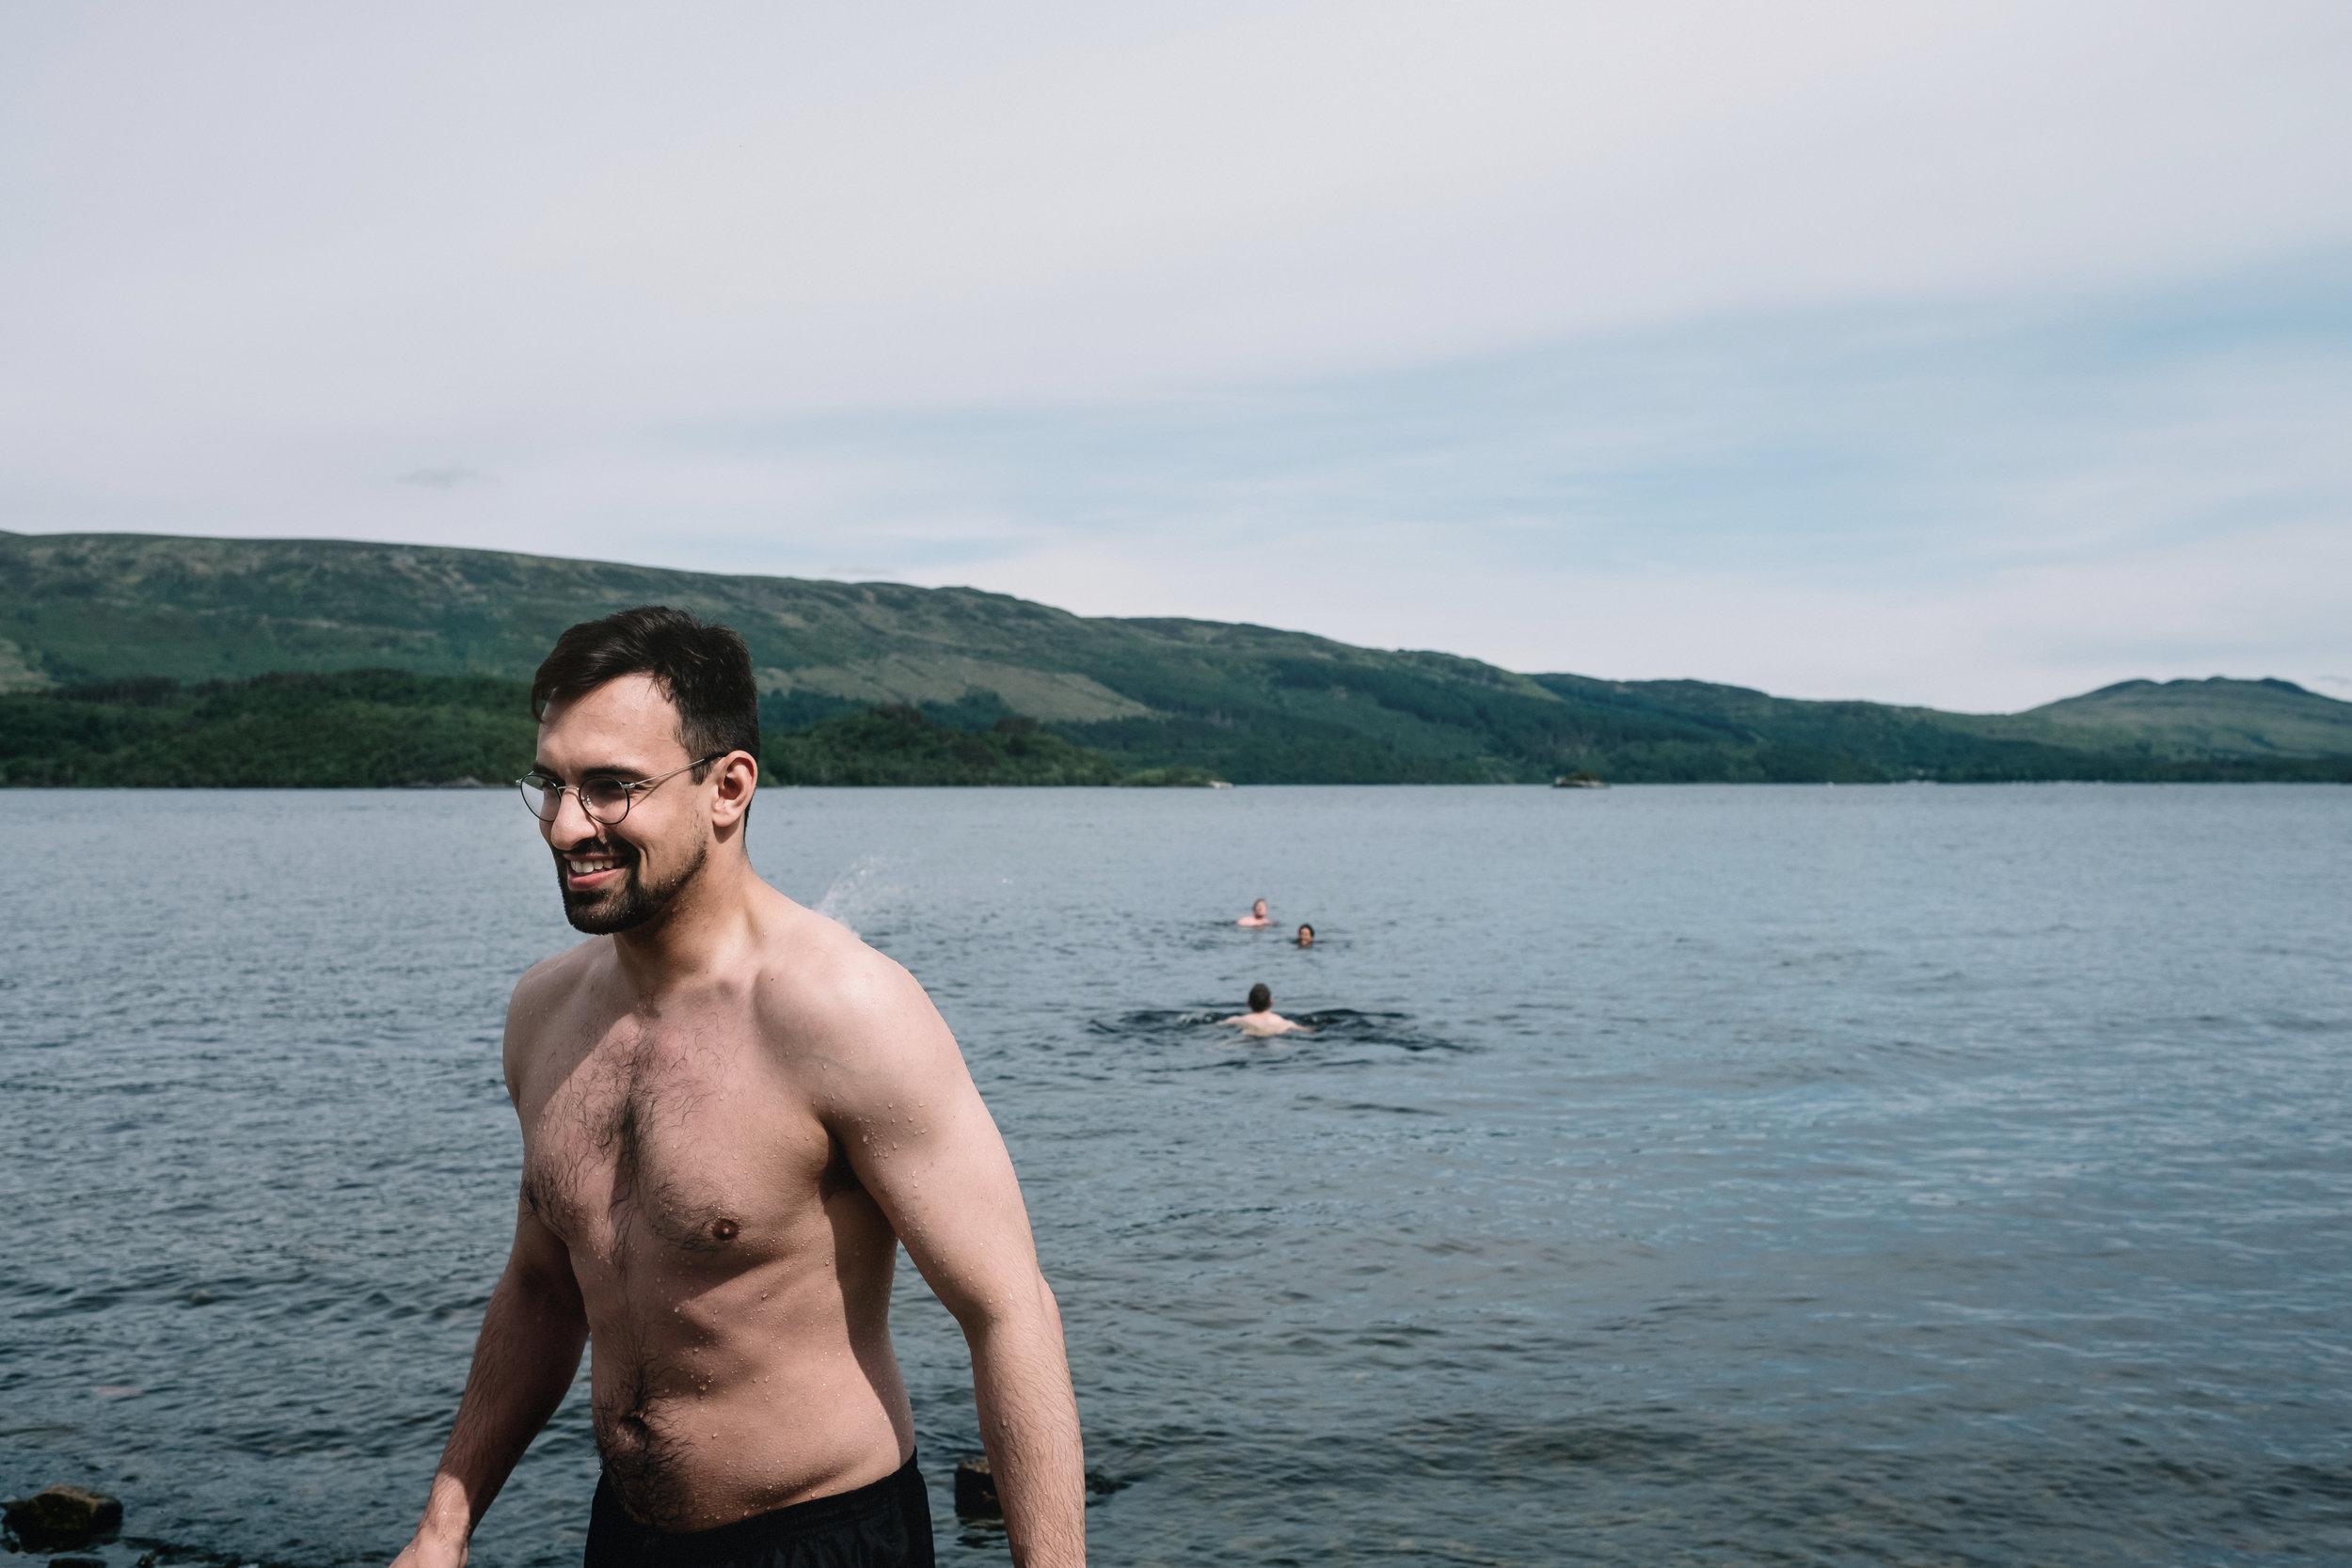 Wedding guest swimming in Loch Lomond